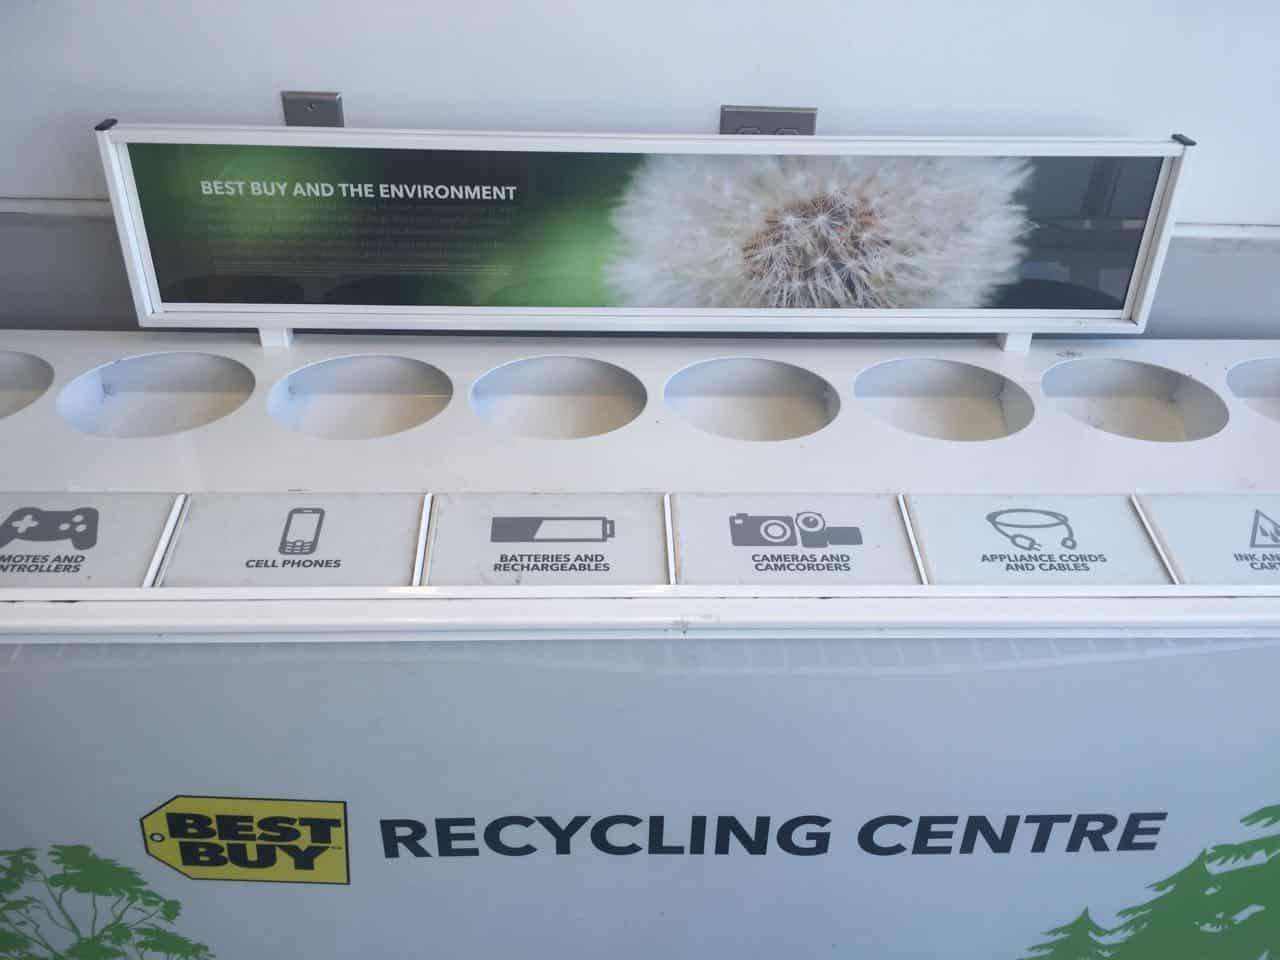 interior-design-showroom-branding-brand-visual-merchandising-display-recycling-electronics-initiative-safe-effective